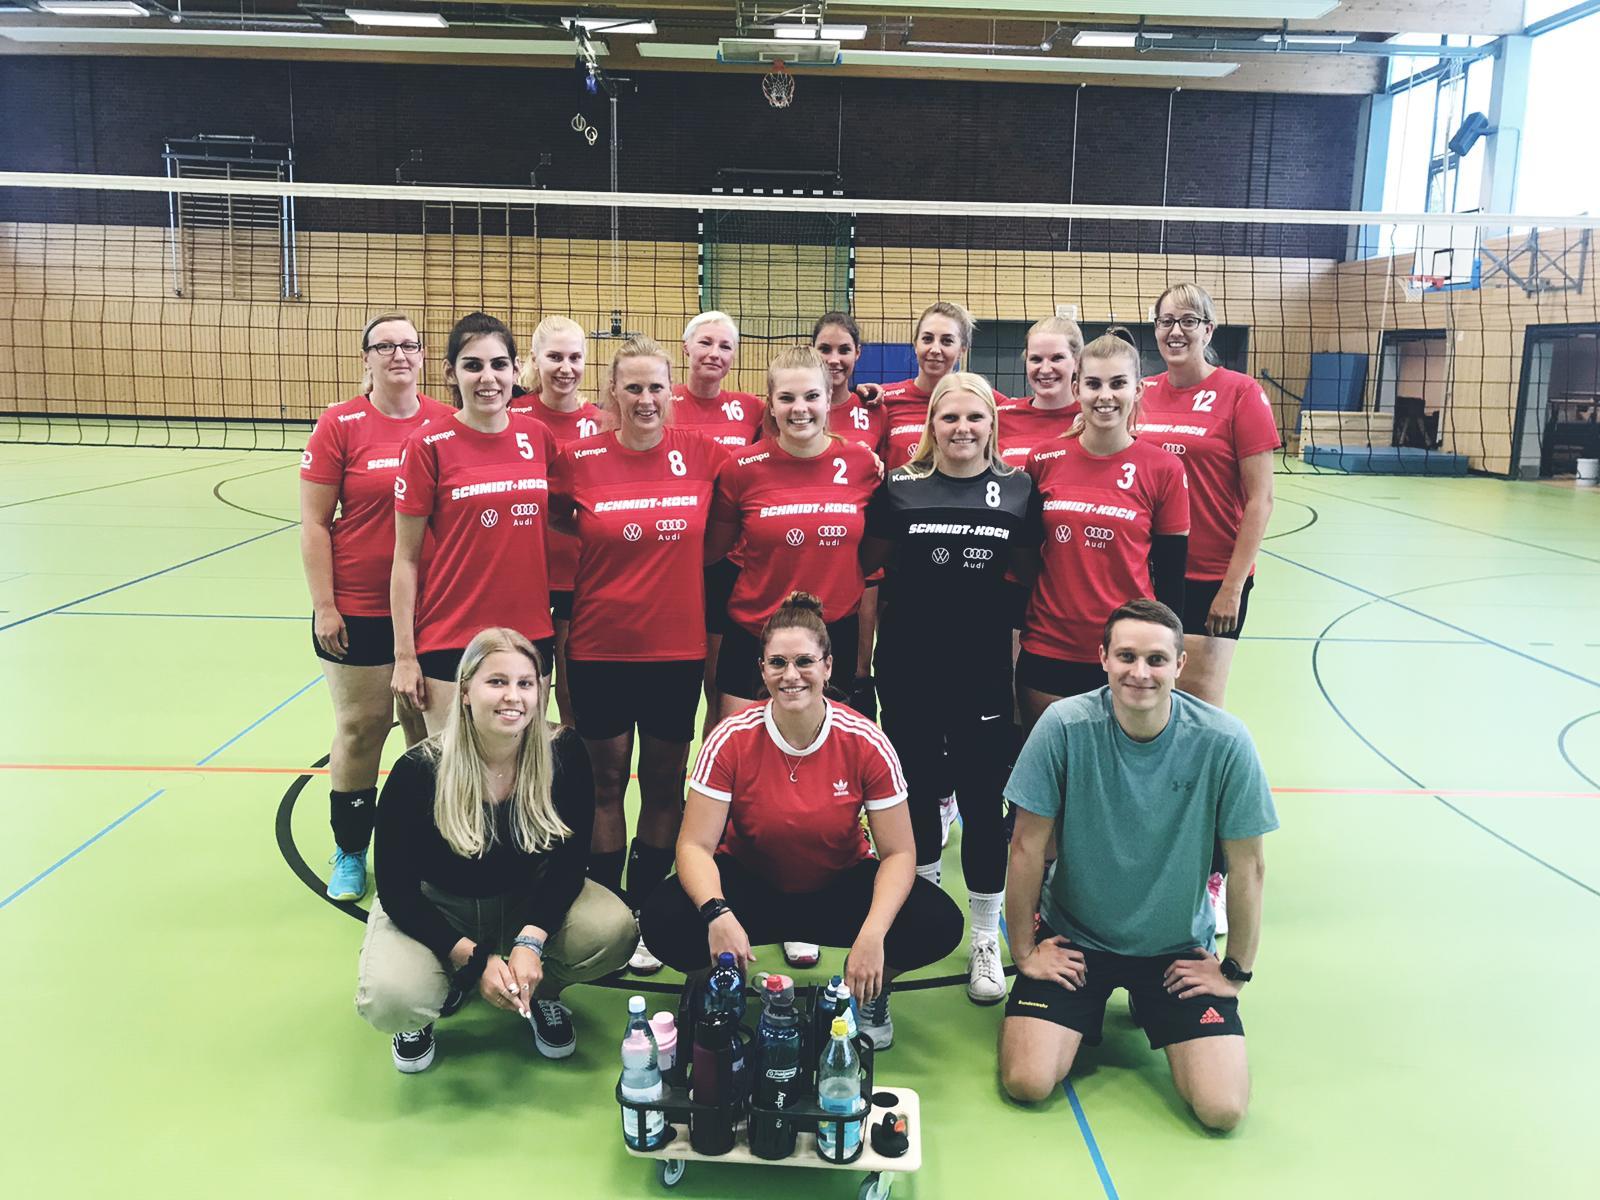 1. Damen Landesliga 2020/2021